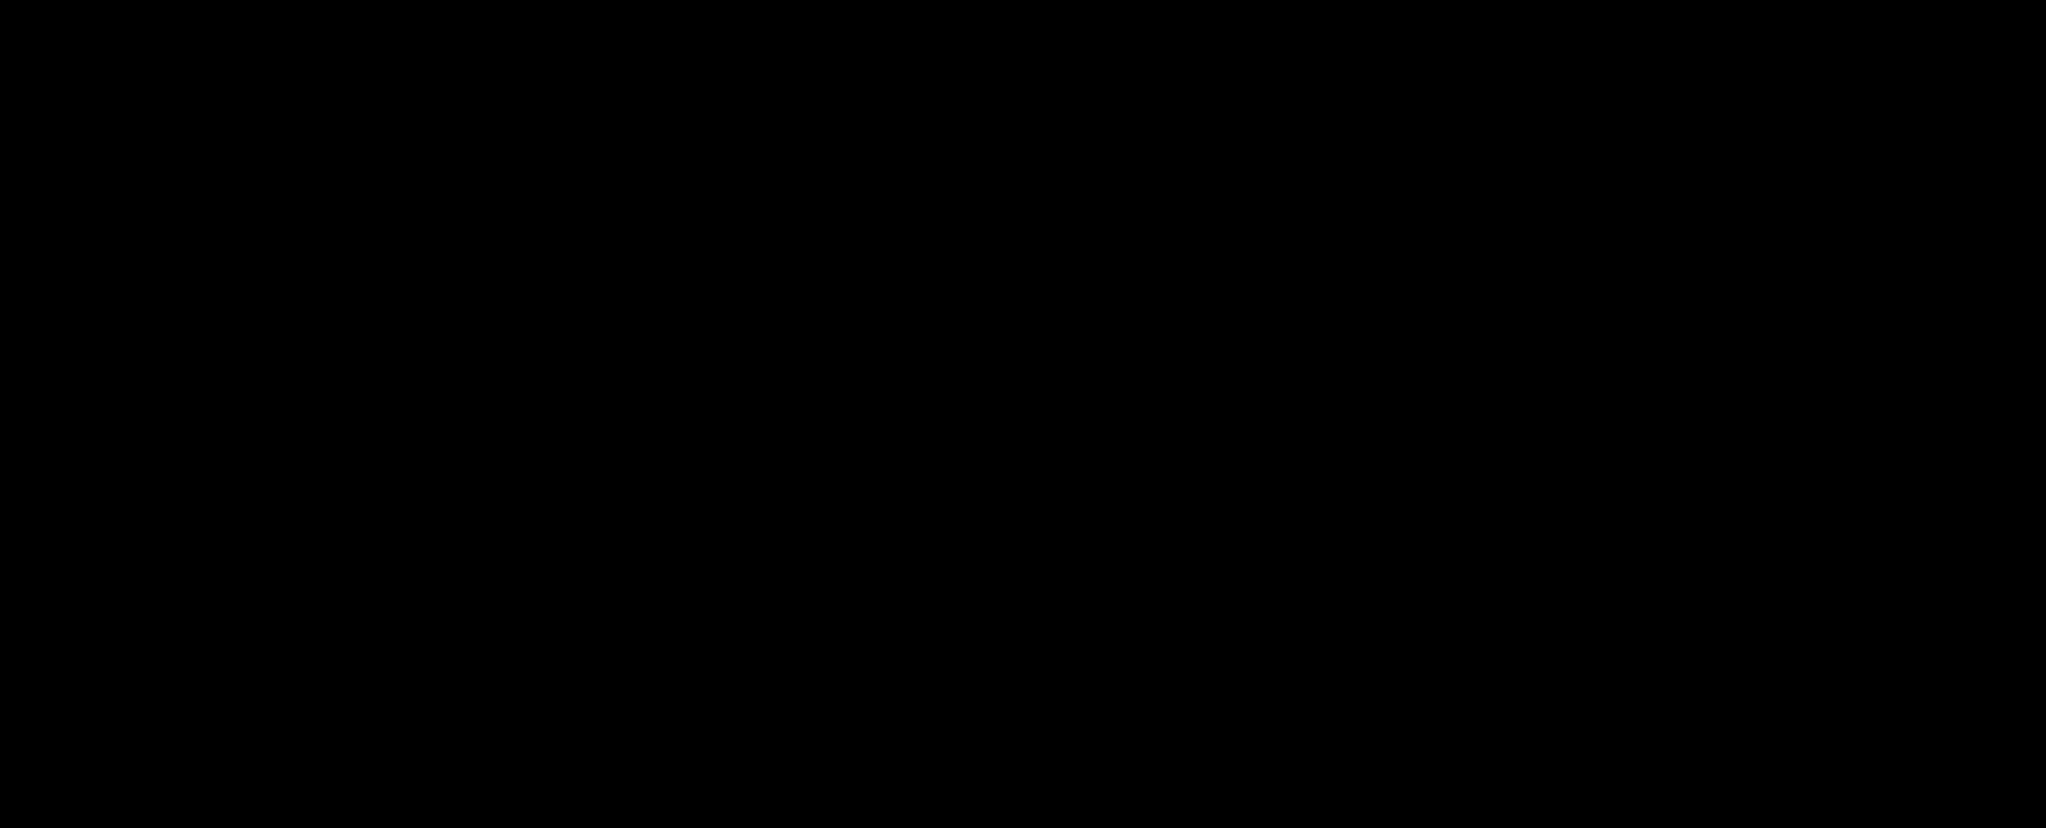 2046x828 19 Soaring Eagle Clip Black And White Download Huge Freebie